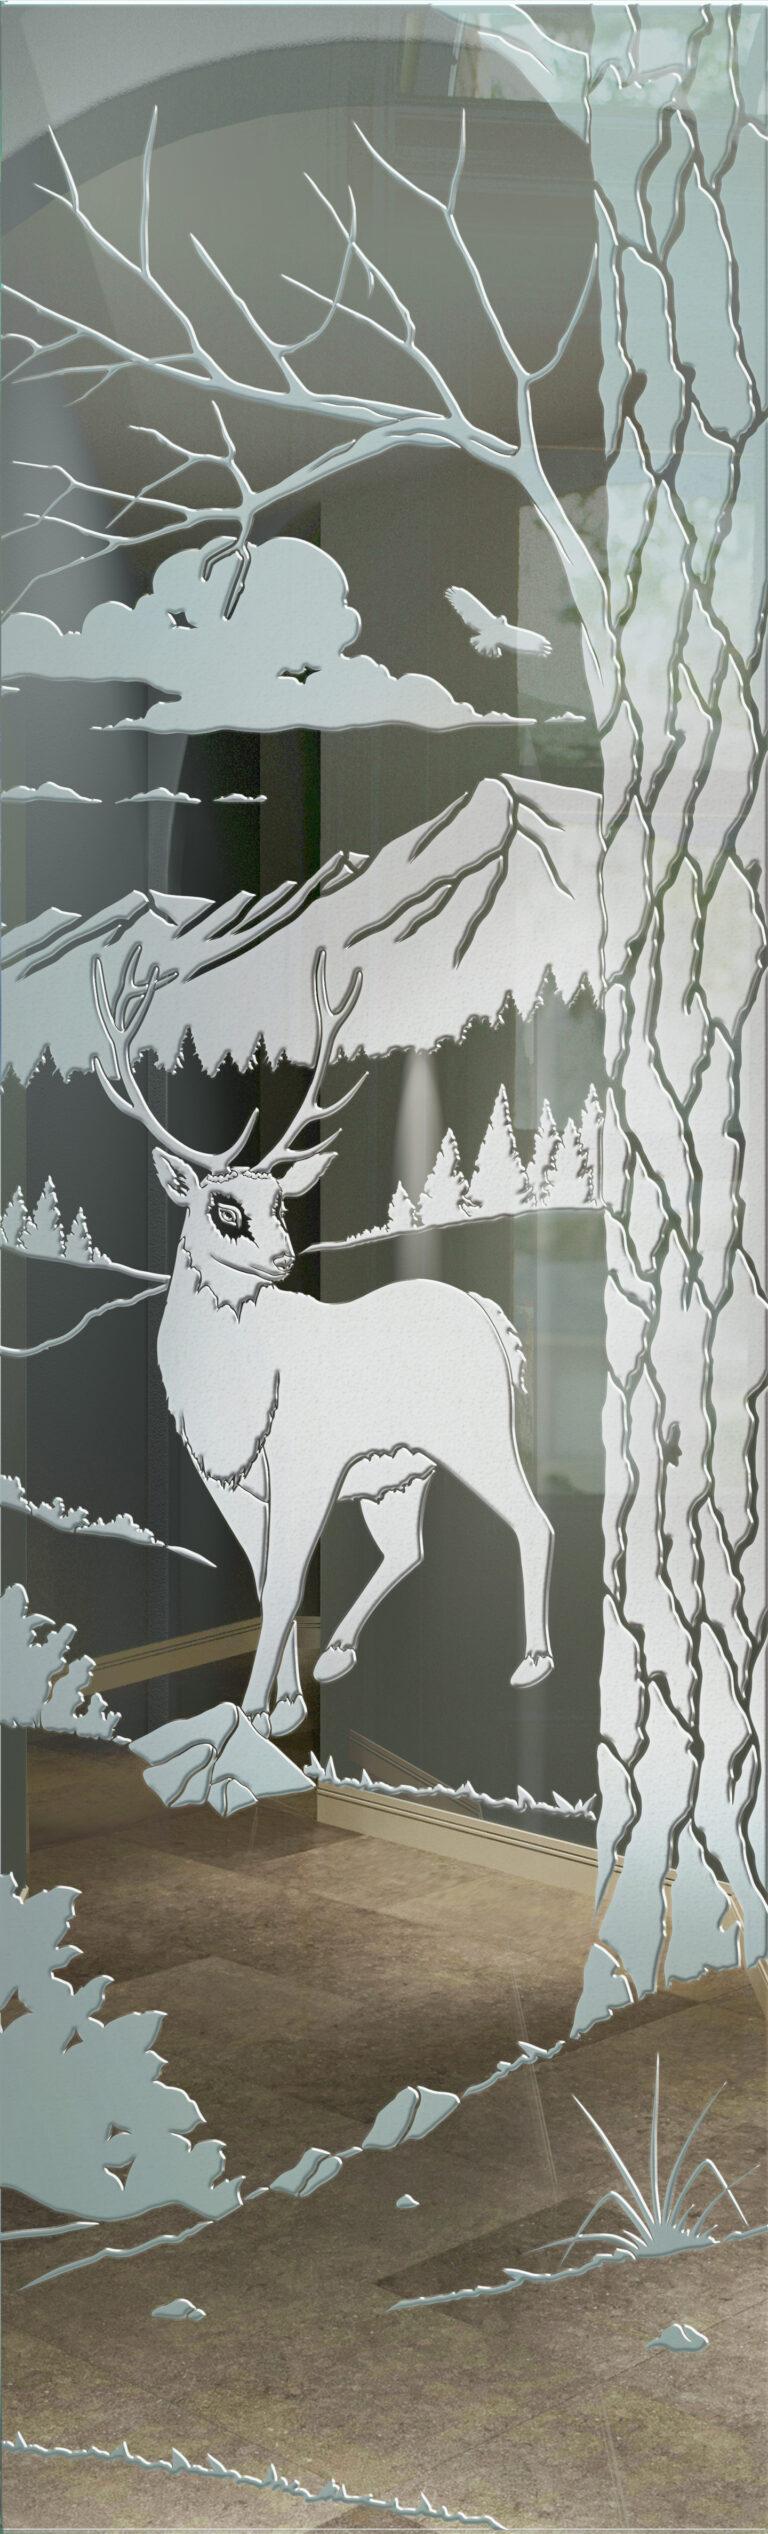 Wandering White Tail